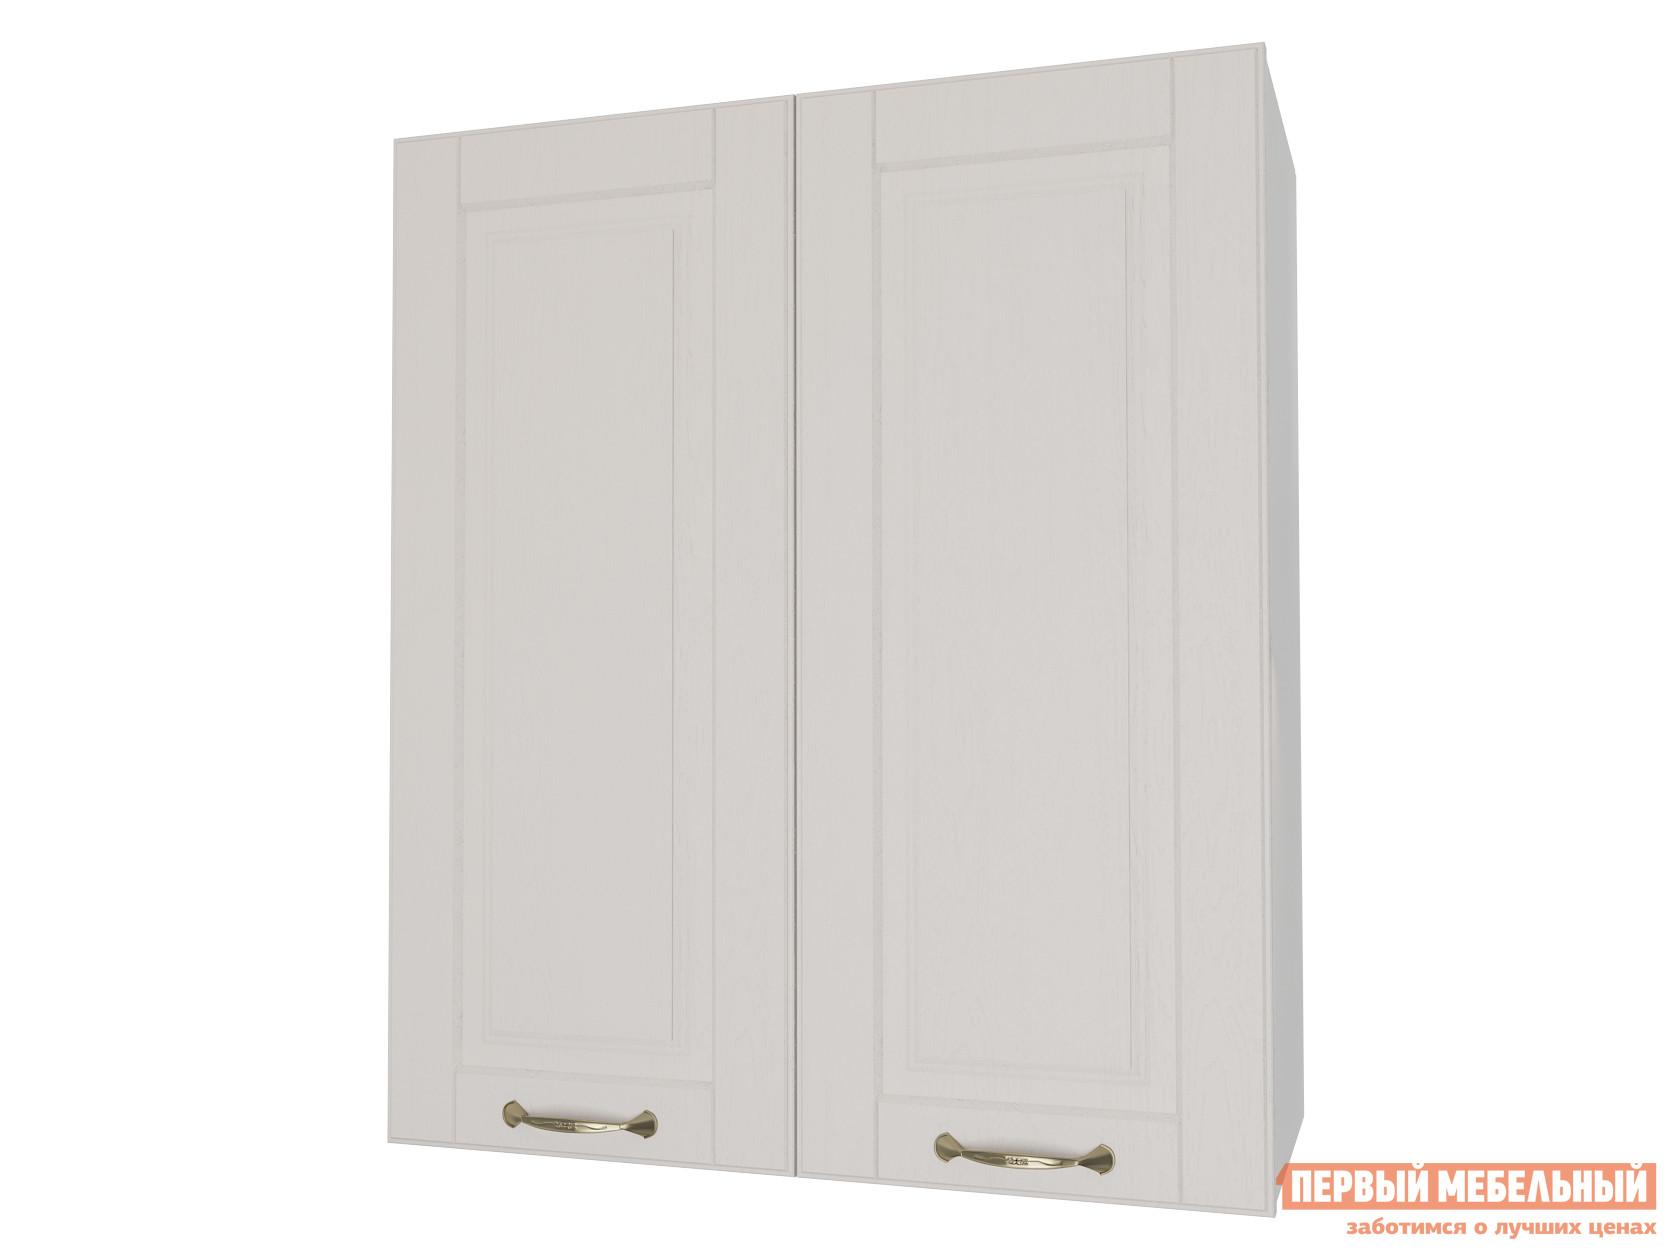 Кухонный модуль ПМ: РДМ Шкаф 2 двери 60 см Палермо Мускат